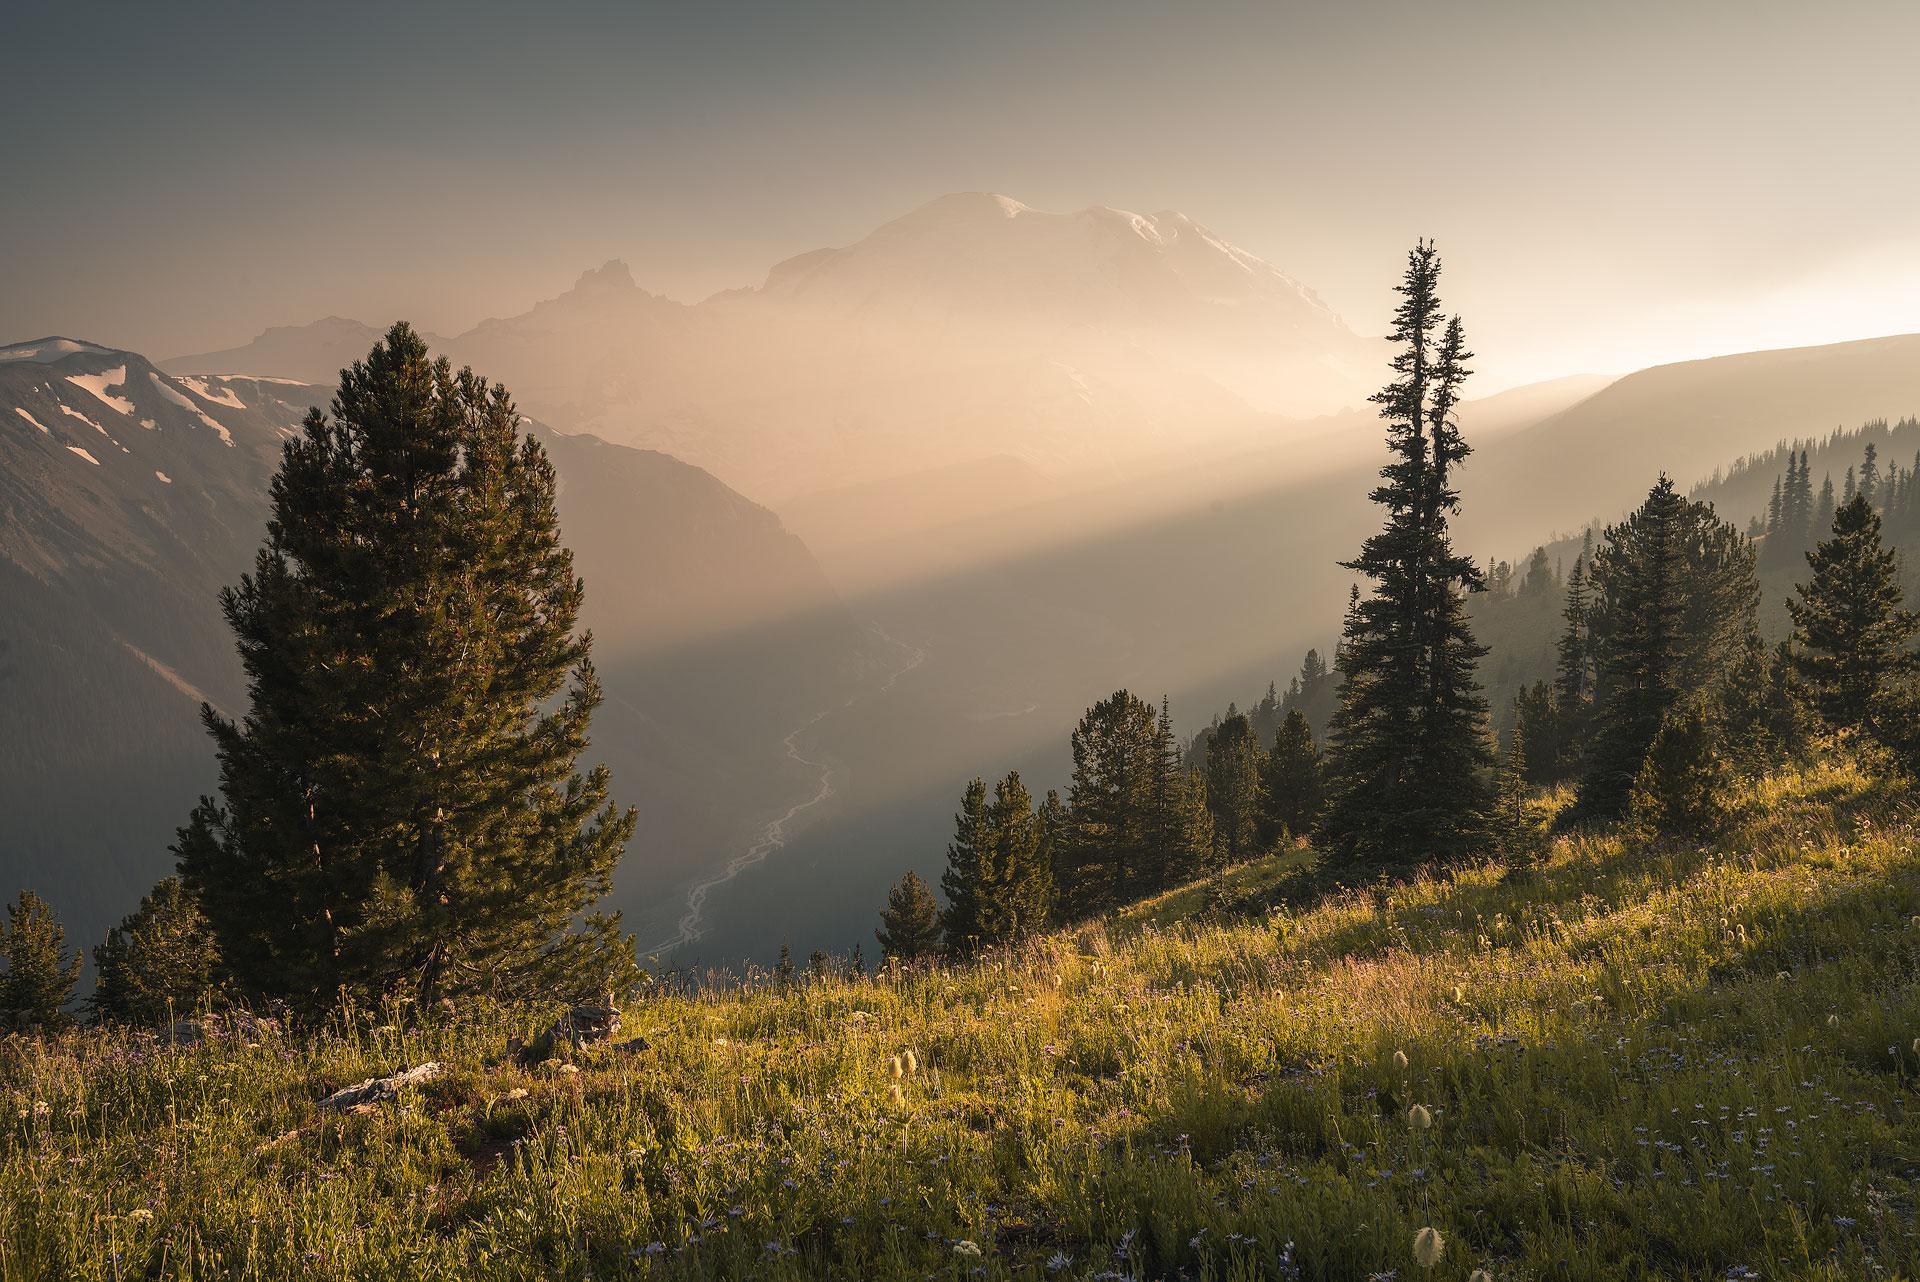 Golden hour shot of a mountain scene